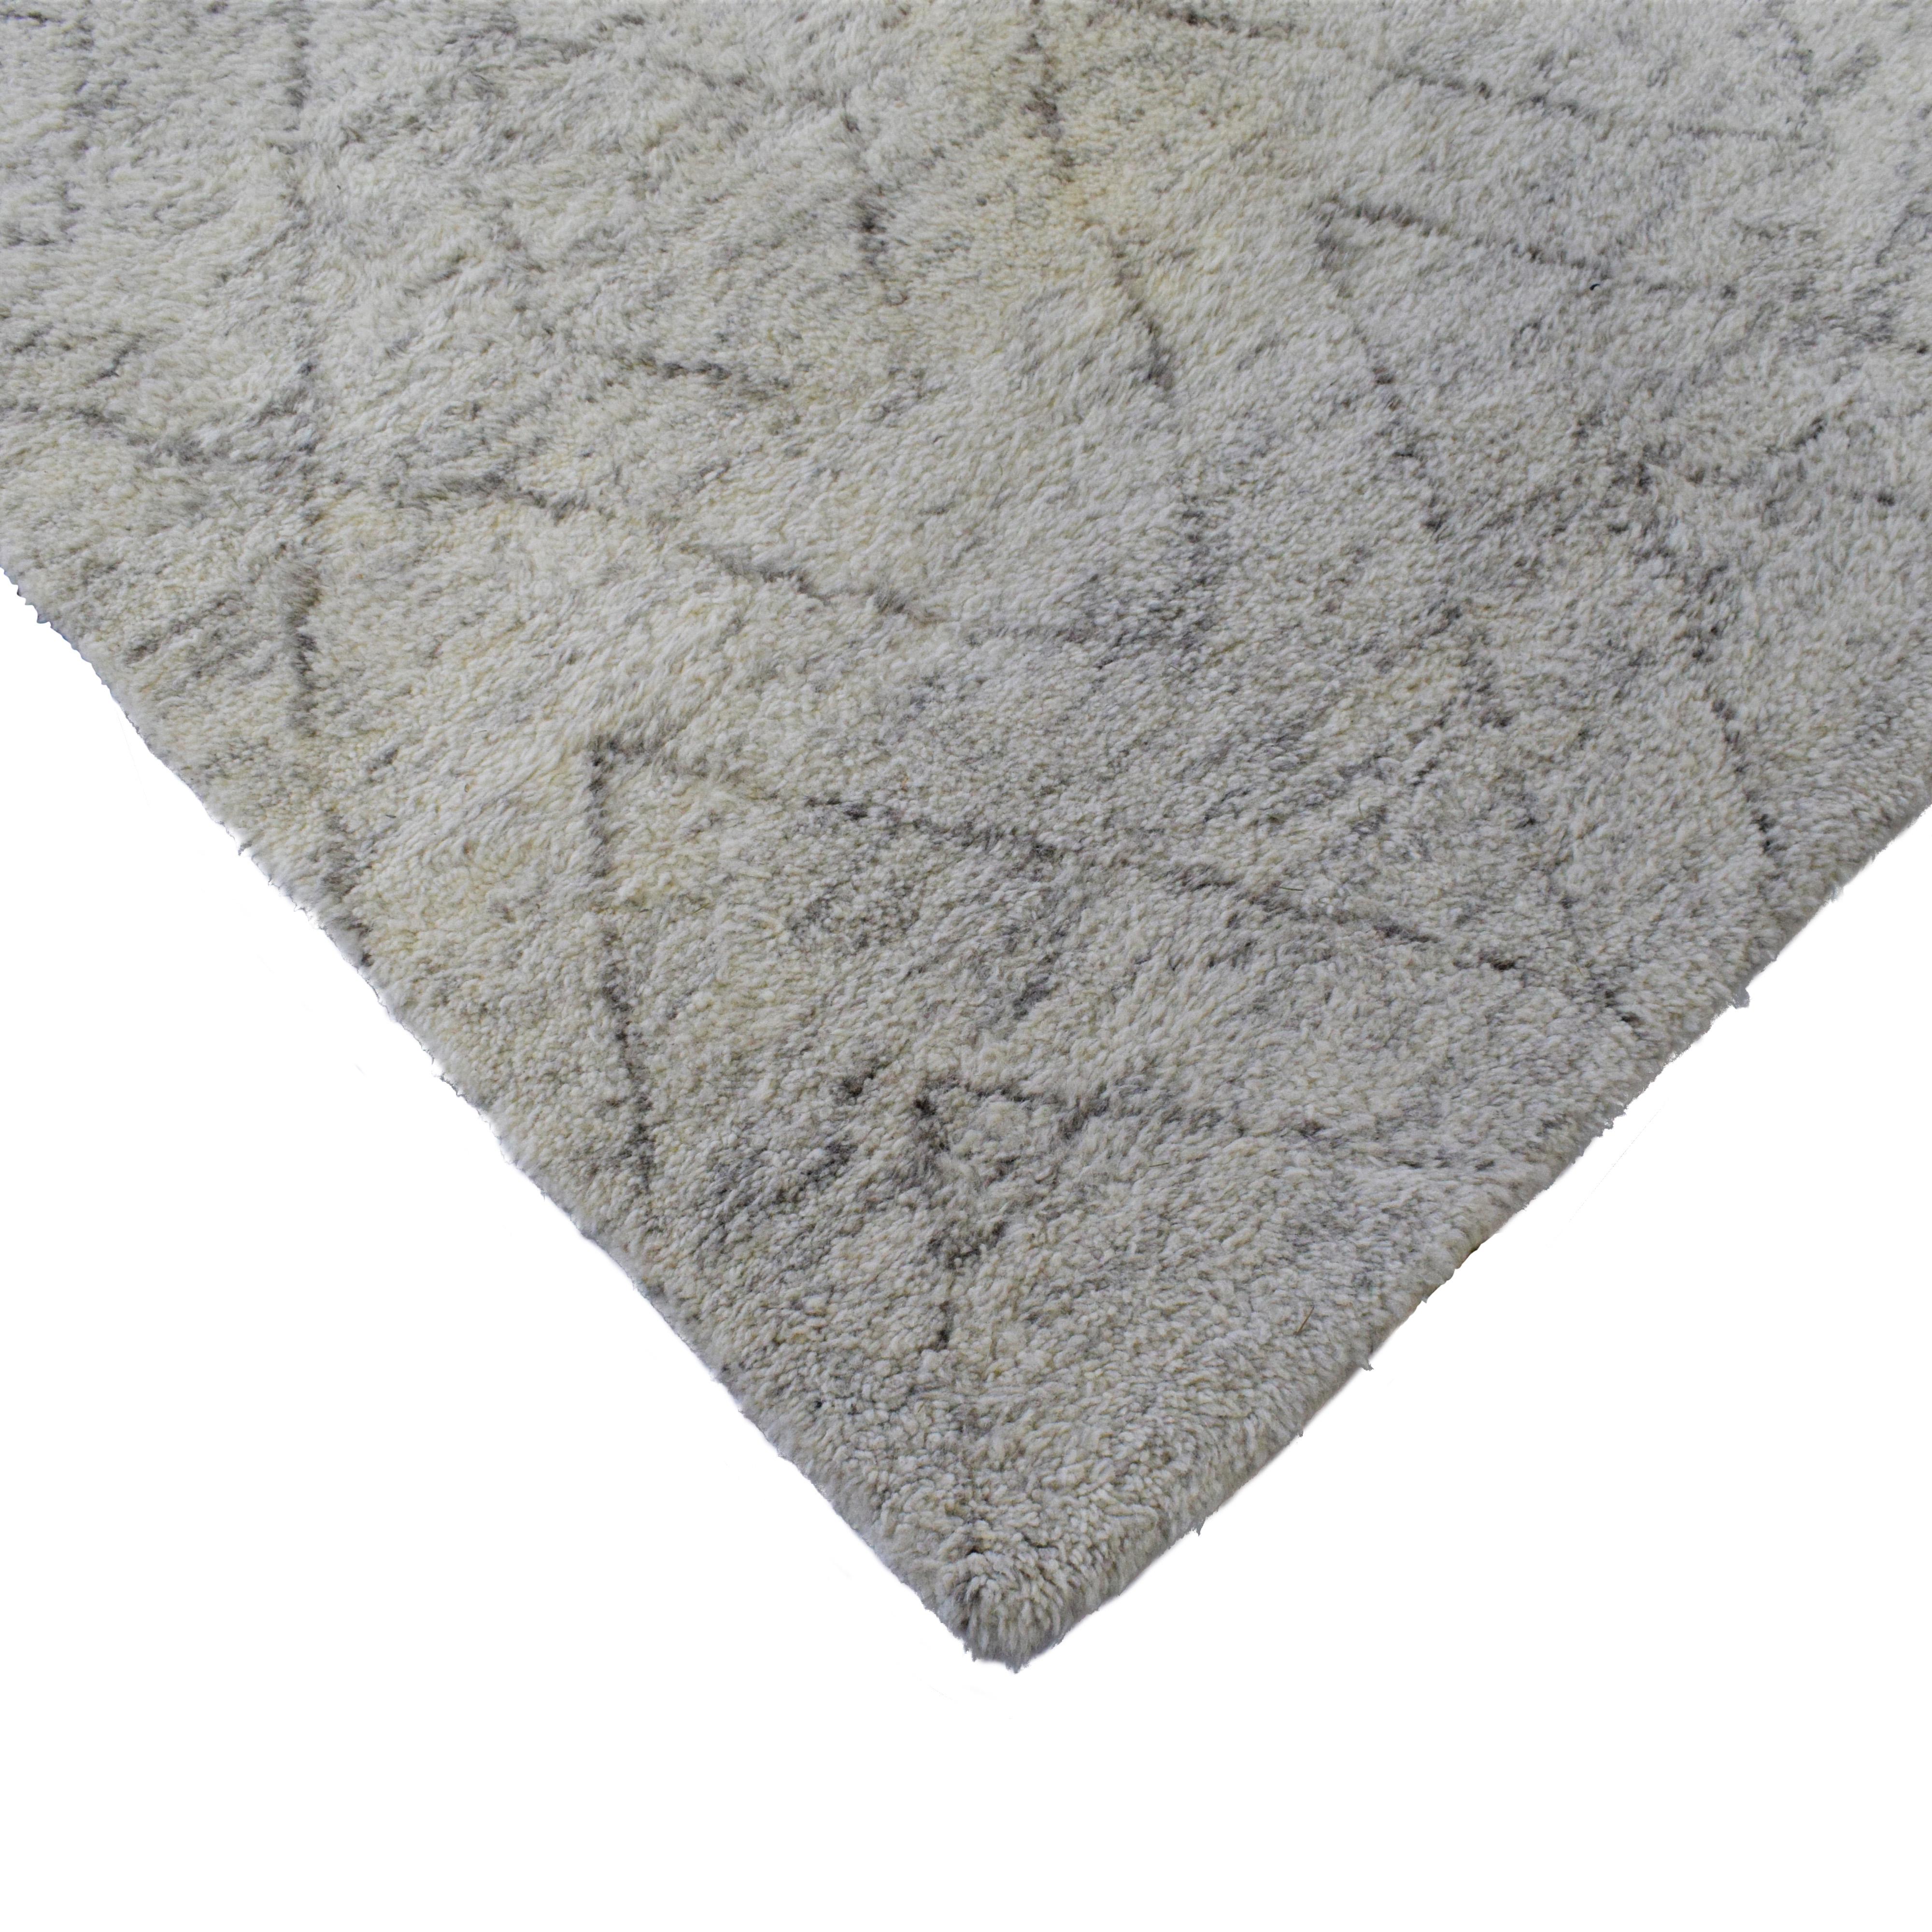 Restoration Hardware Restoration Hardware Ben Soleimani Double Diamond Moroccan Wool Rug price